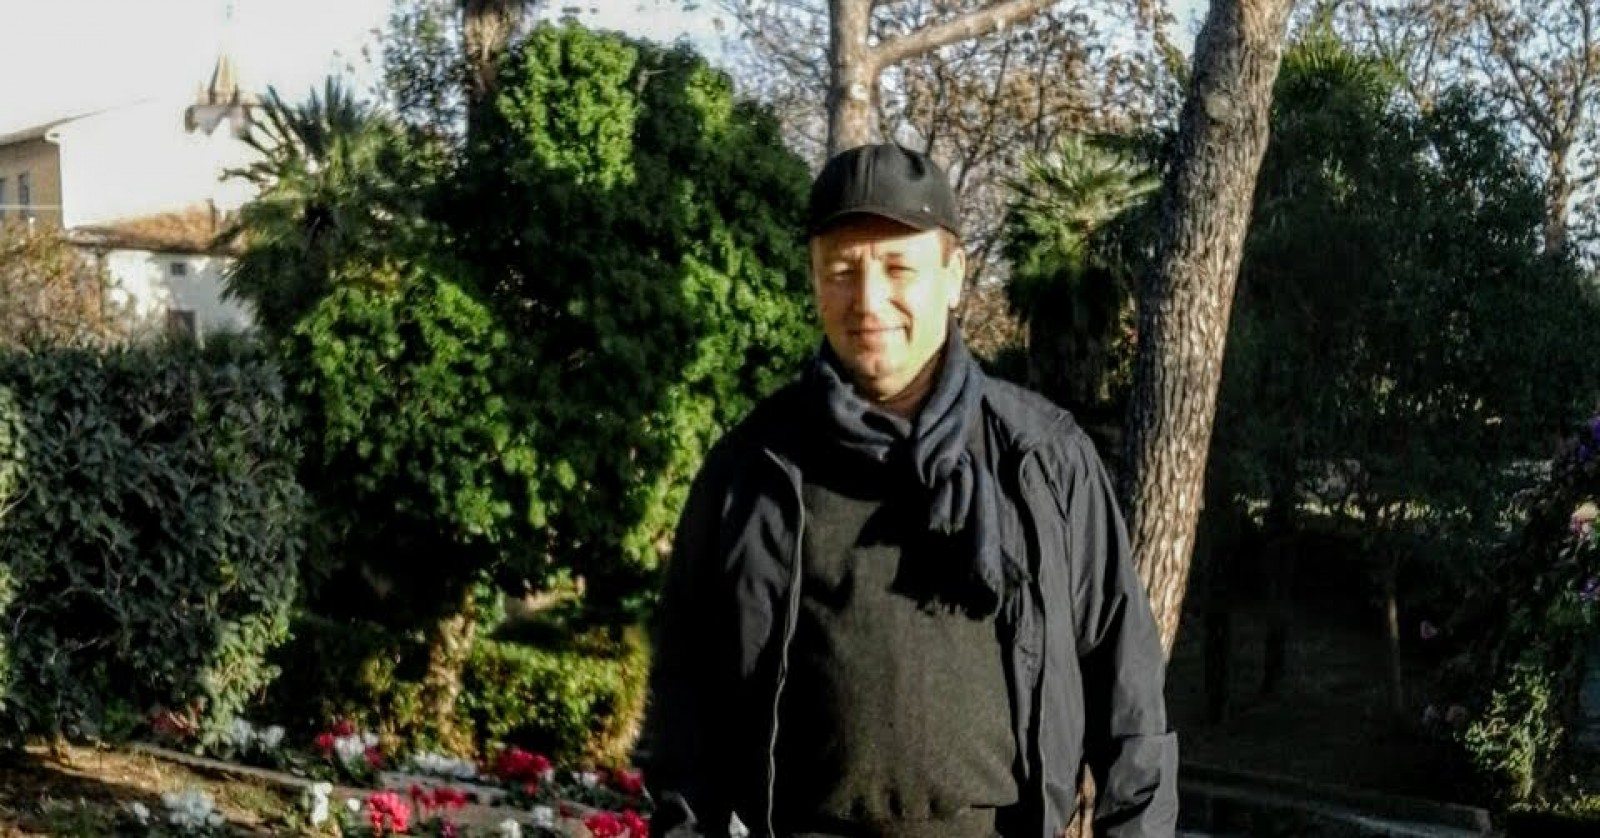 Moldovean stabilit în Italia: La început dormeam și prin vagoane